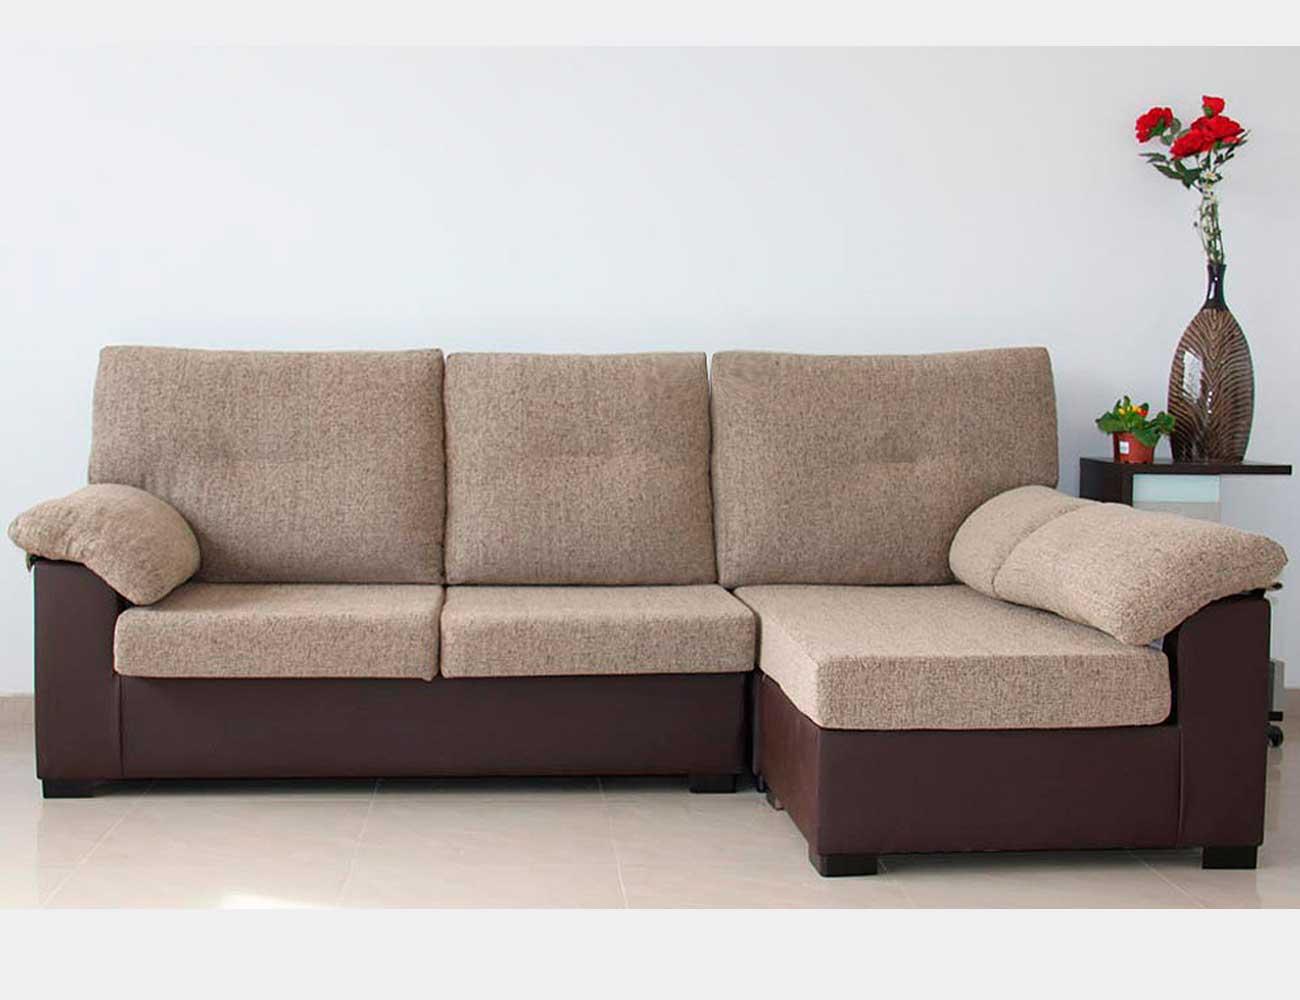 Sofa chaise longue barato6